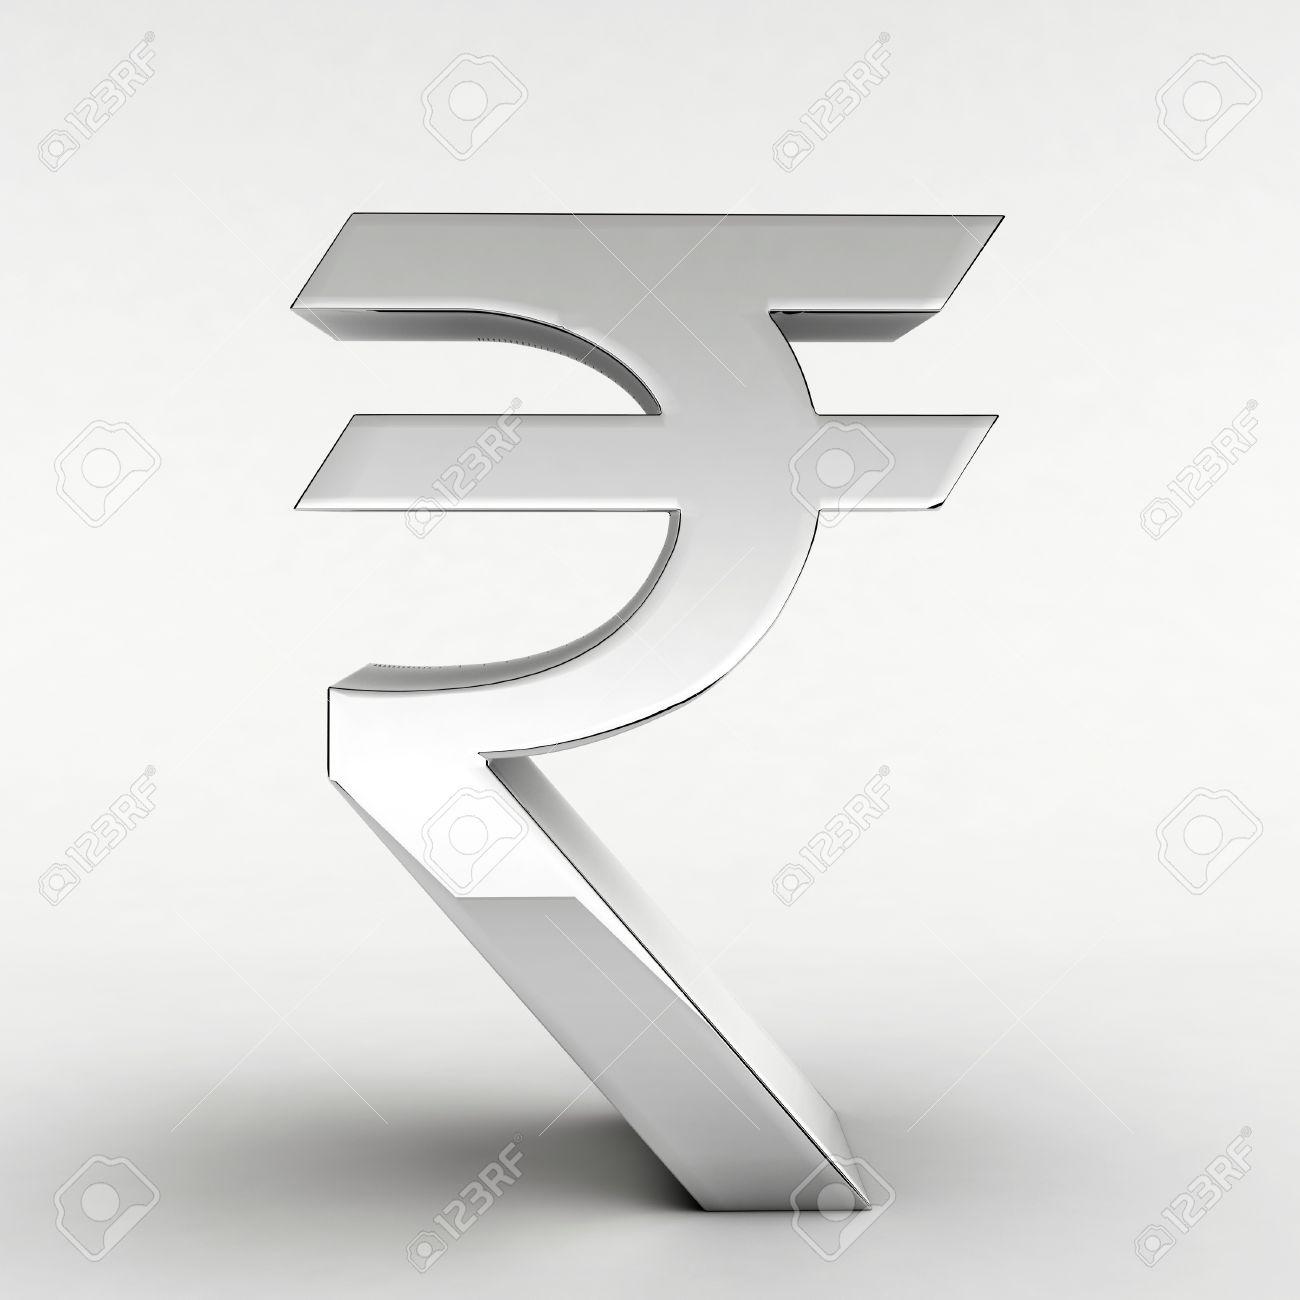 Silver indian rupee symbol 3d rendering stock photo picture and silver indian rupee symbol 3d rendering stock photo 12042830 biocorpaavc Choice Image